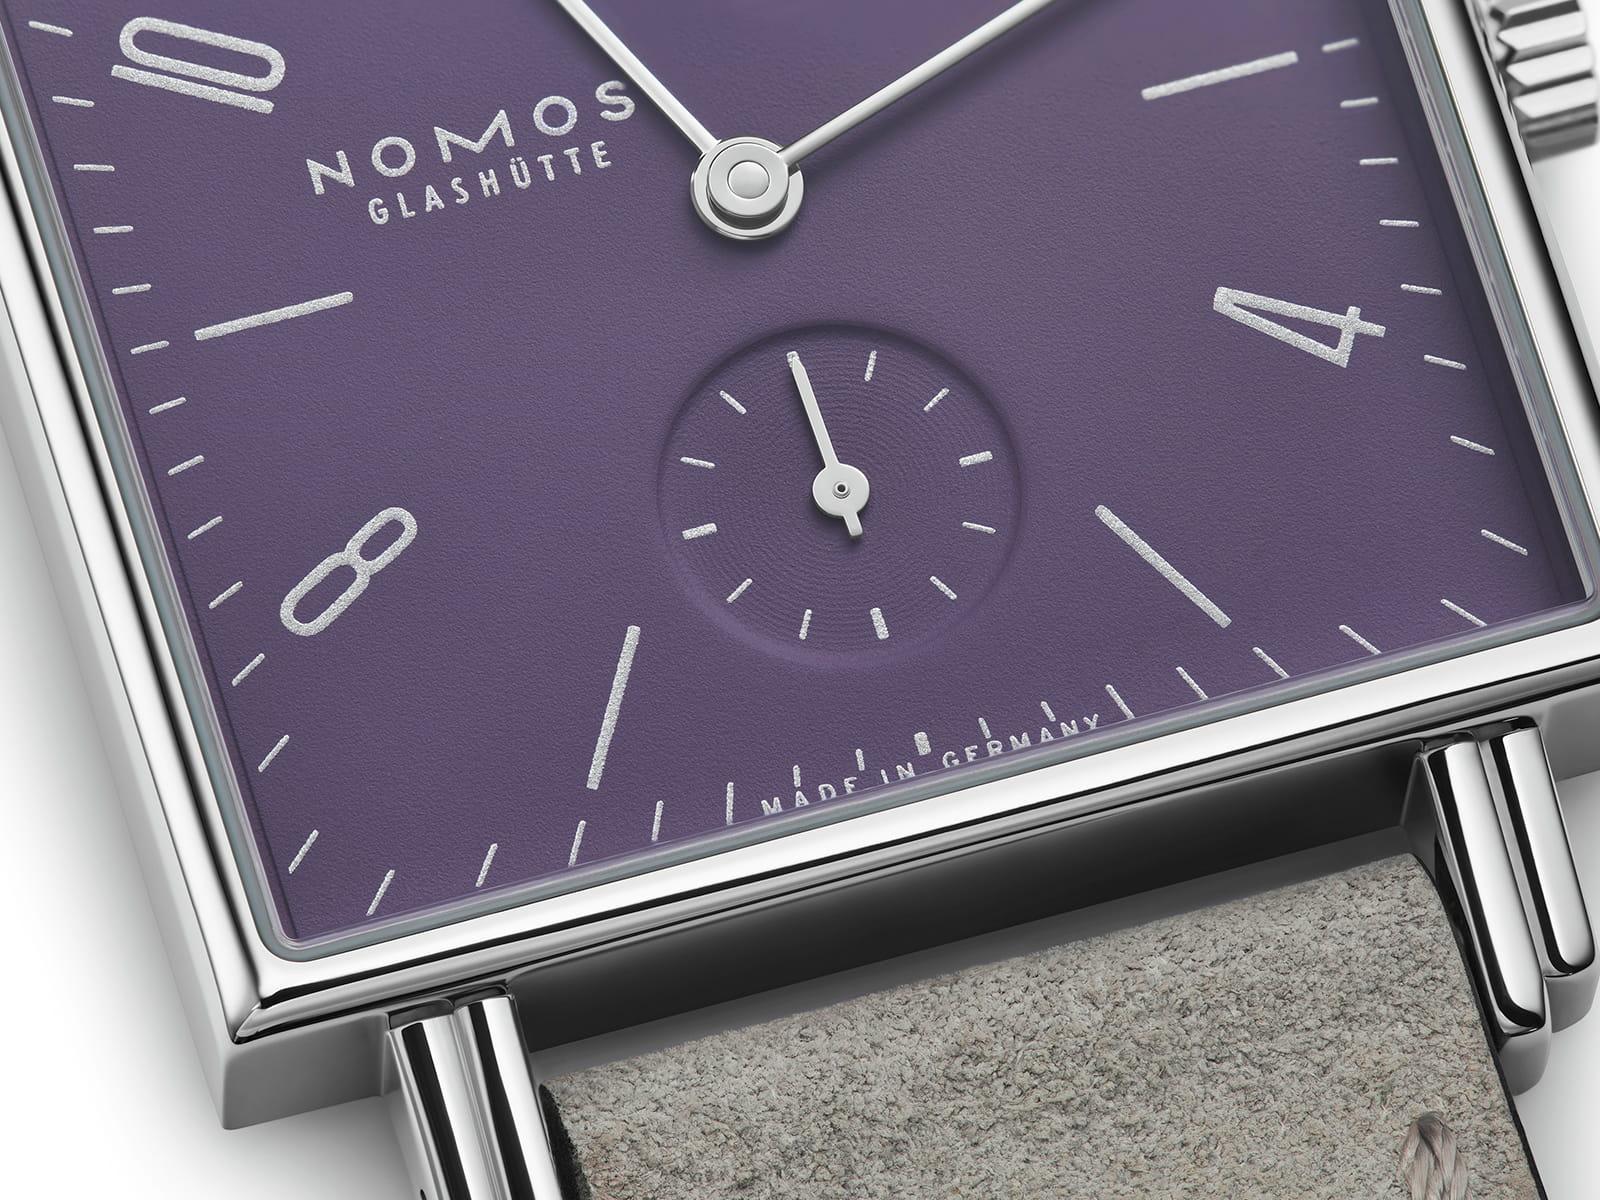 499-nomos-glashutte-tetra-plum-8.jpg